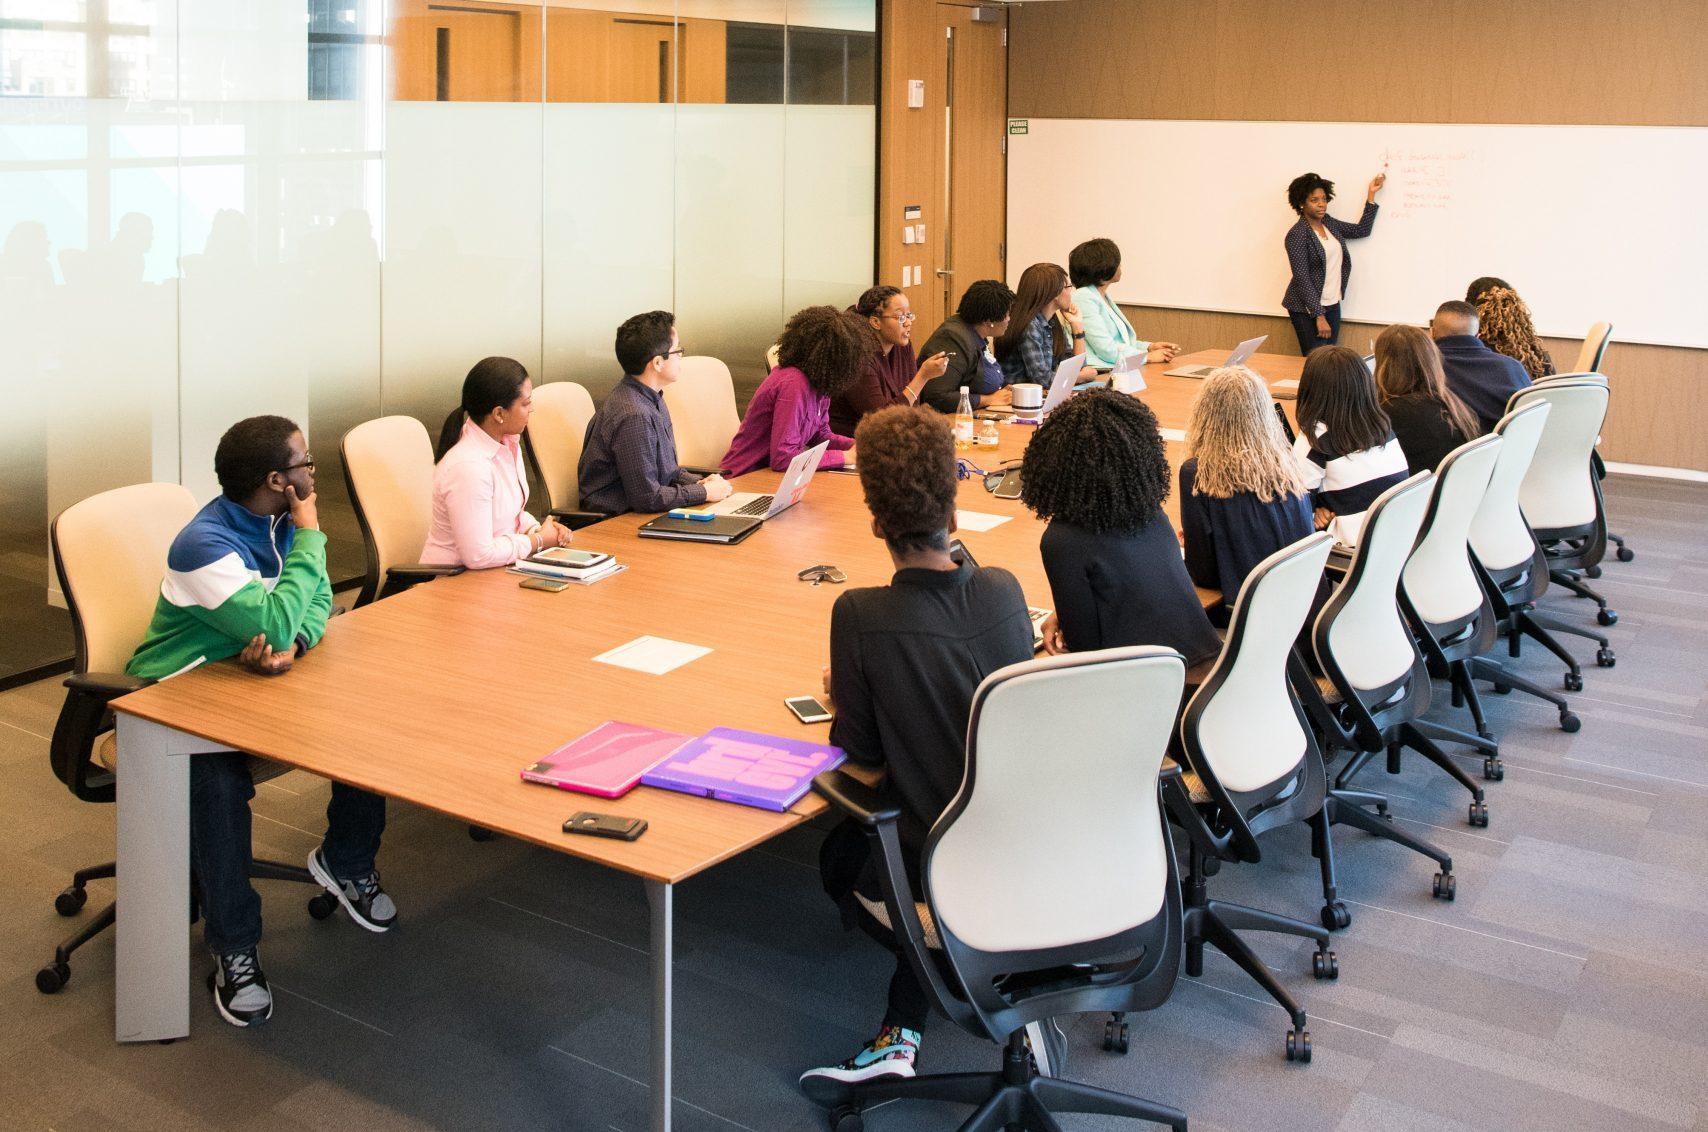 Conducting Classroom Training